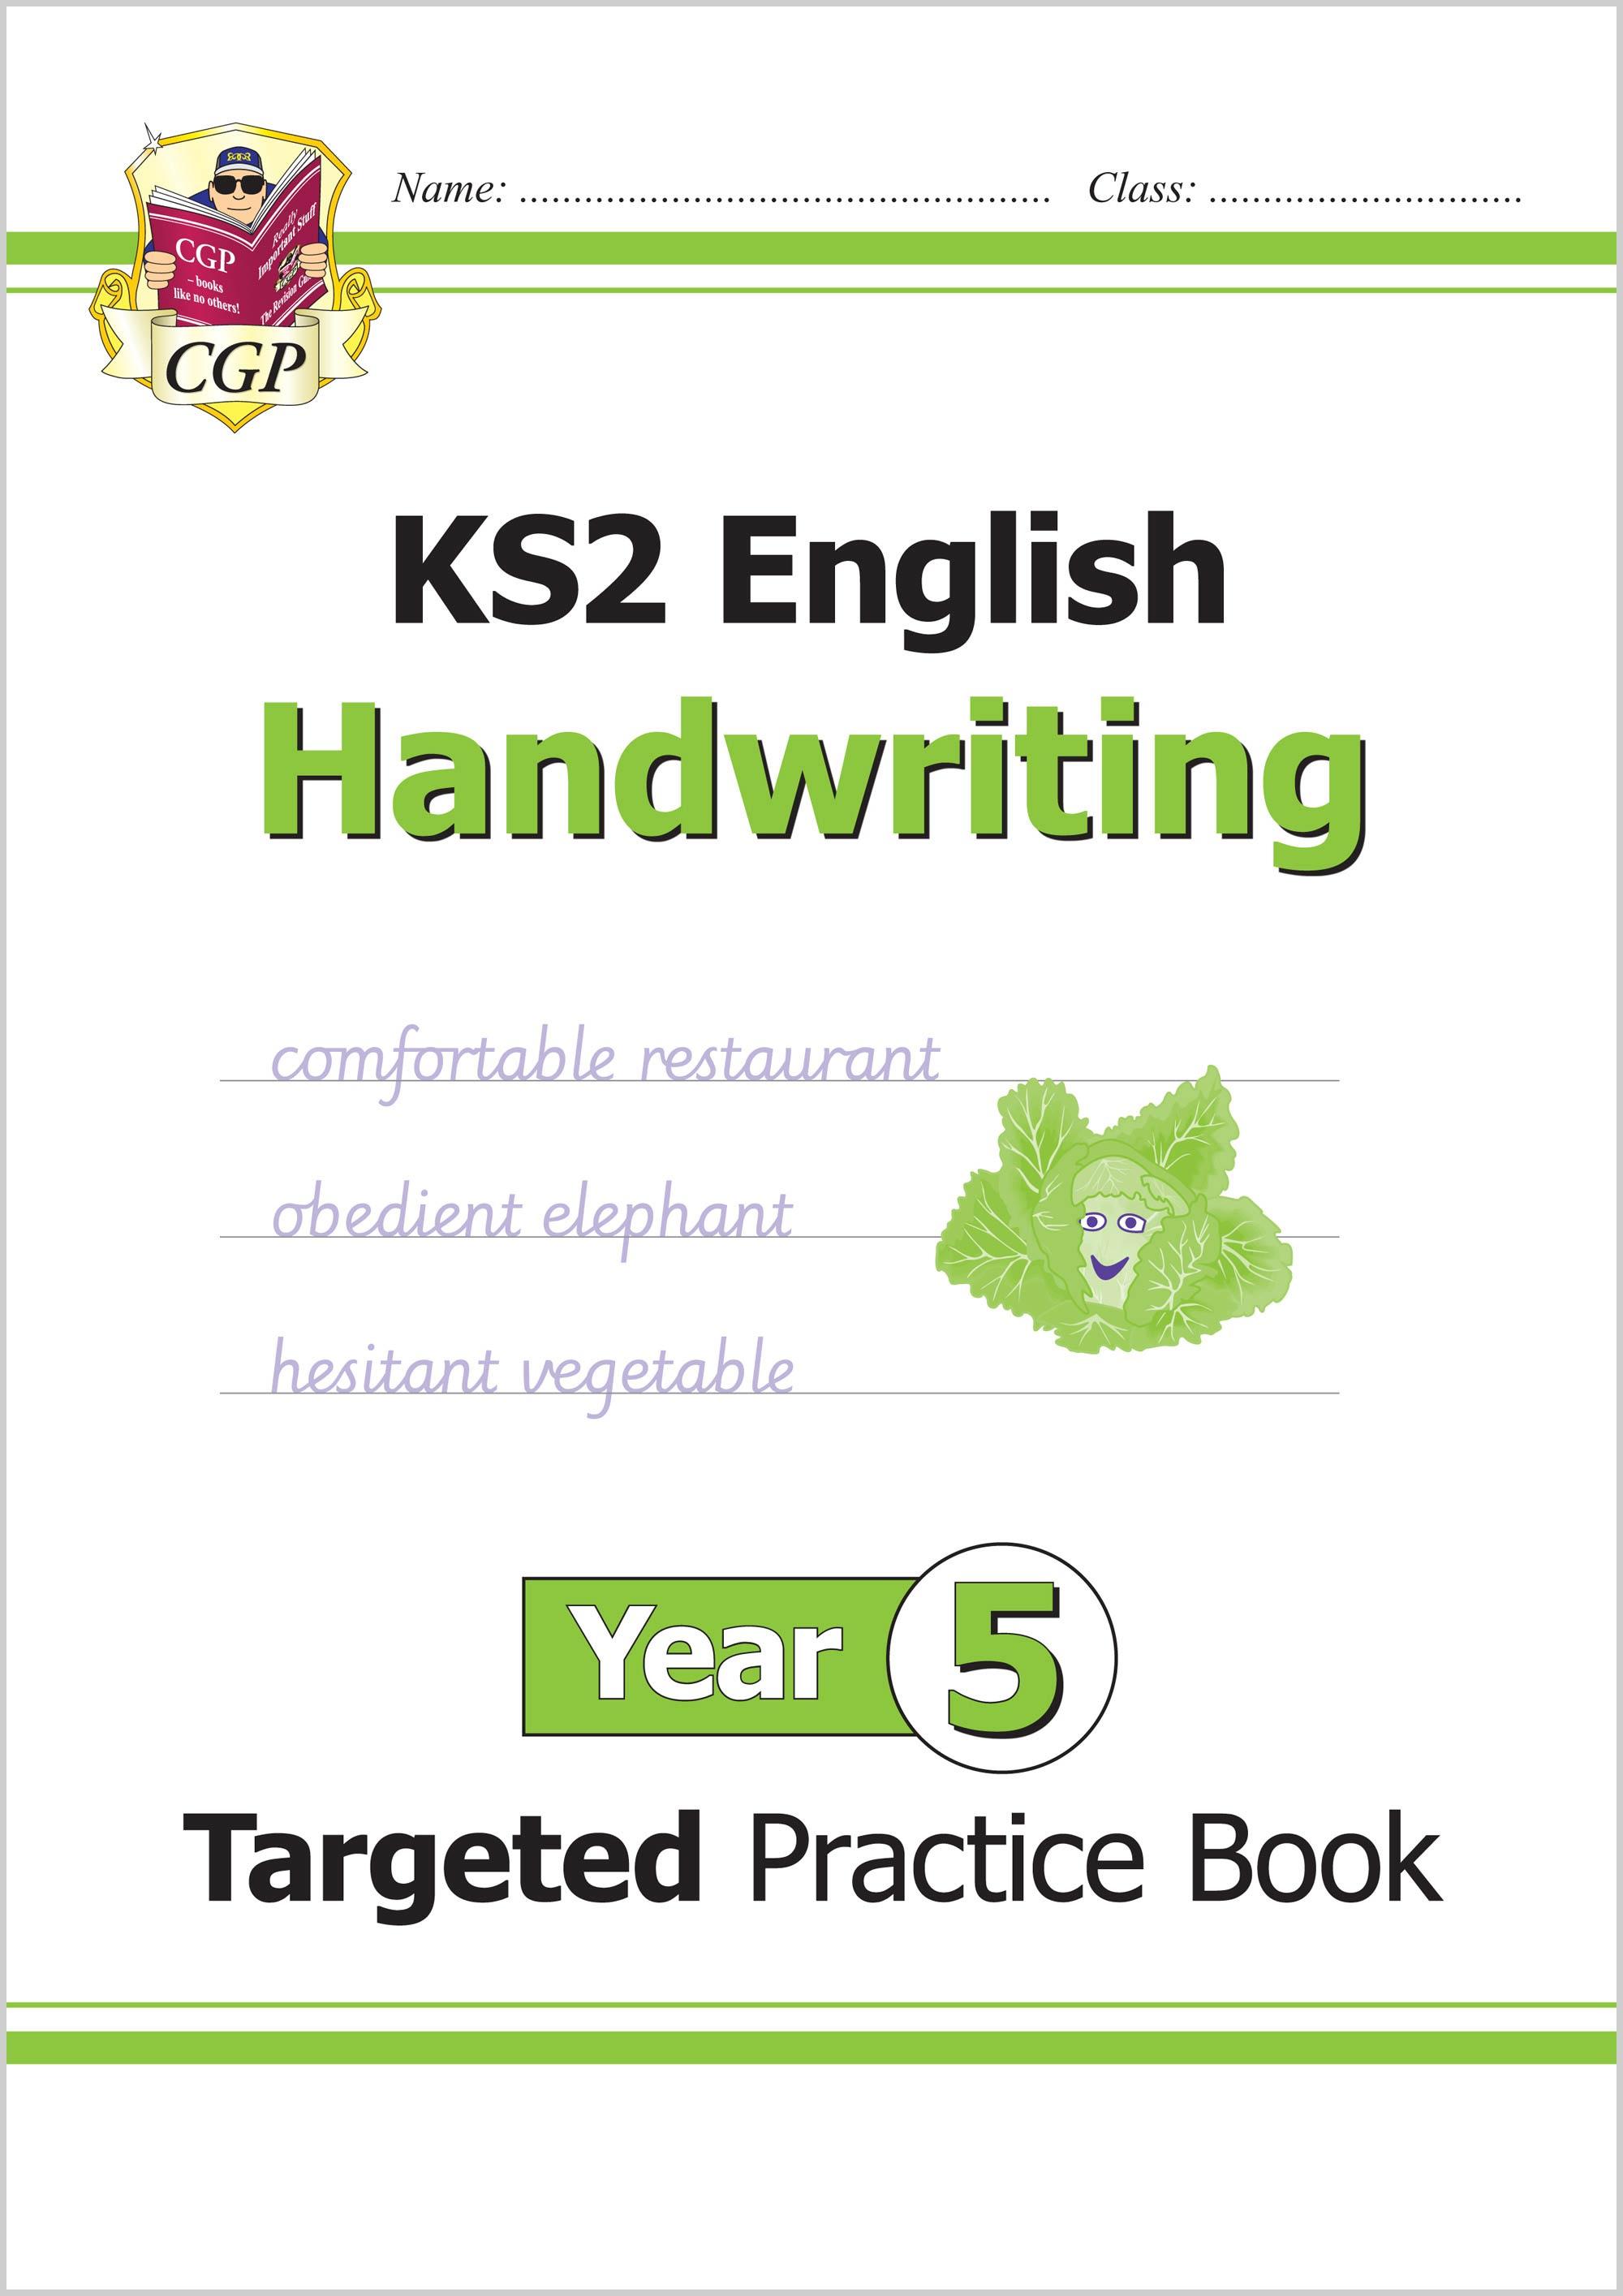 New Ks2 English Targeted Practice Book Handwriting